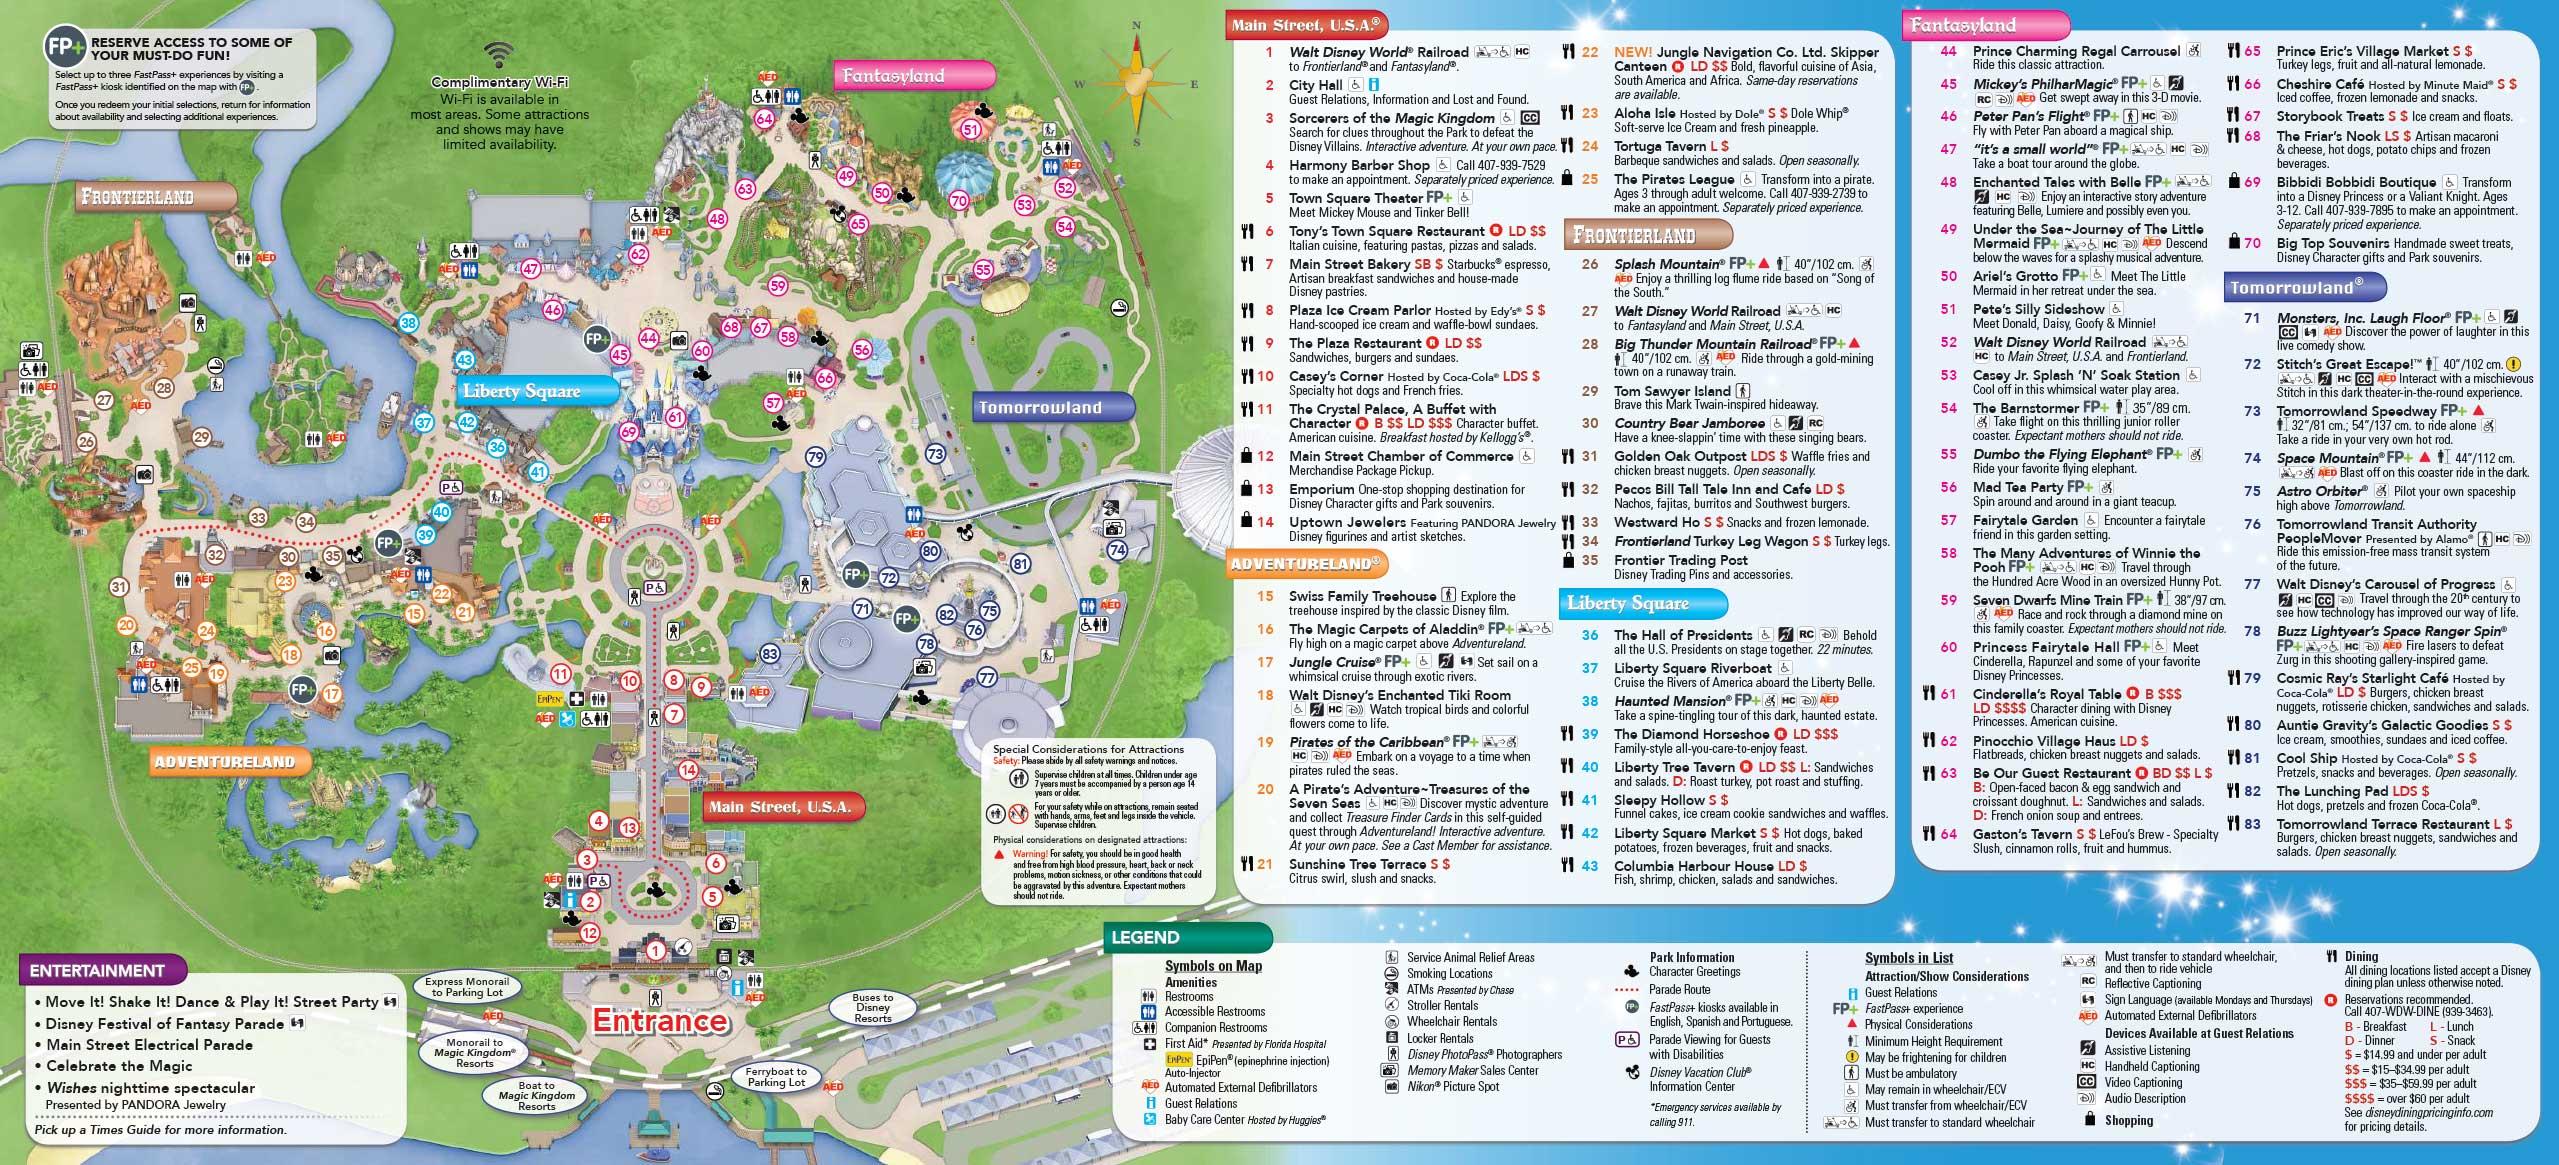 June 2016 Walt Disney World Park Maps - Photo 2 of 4